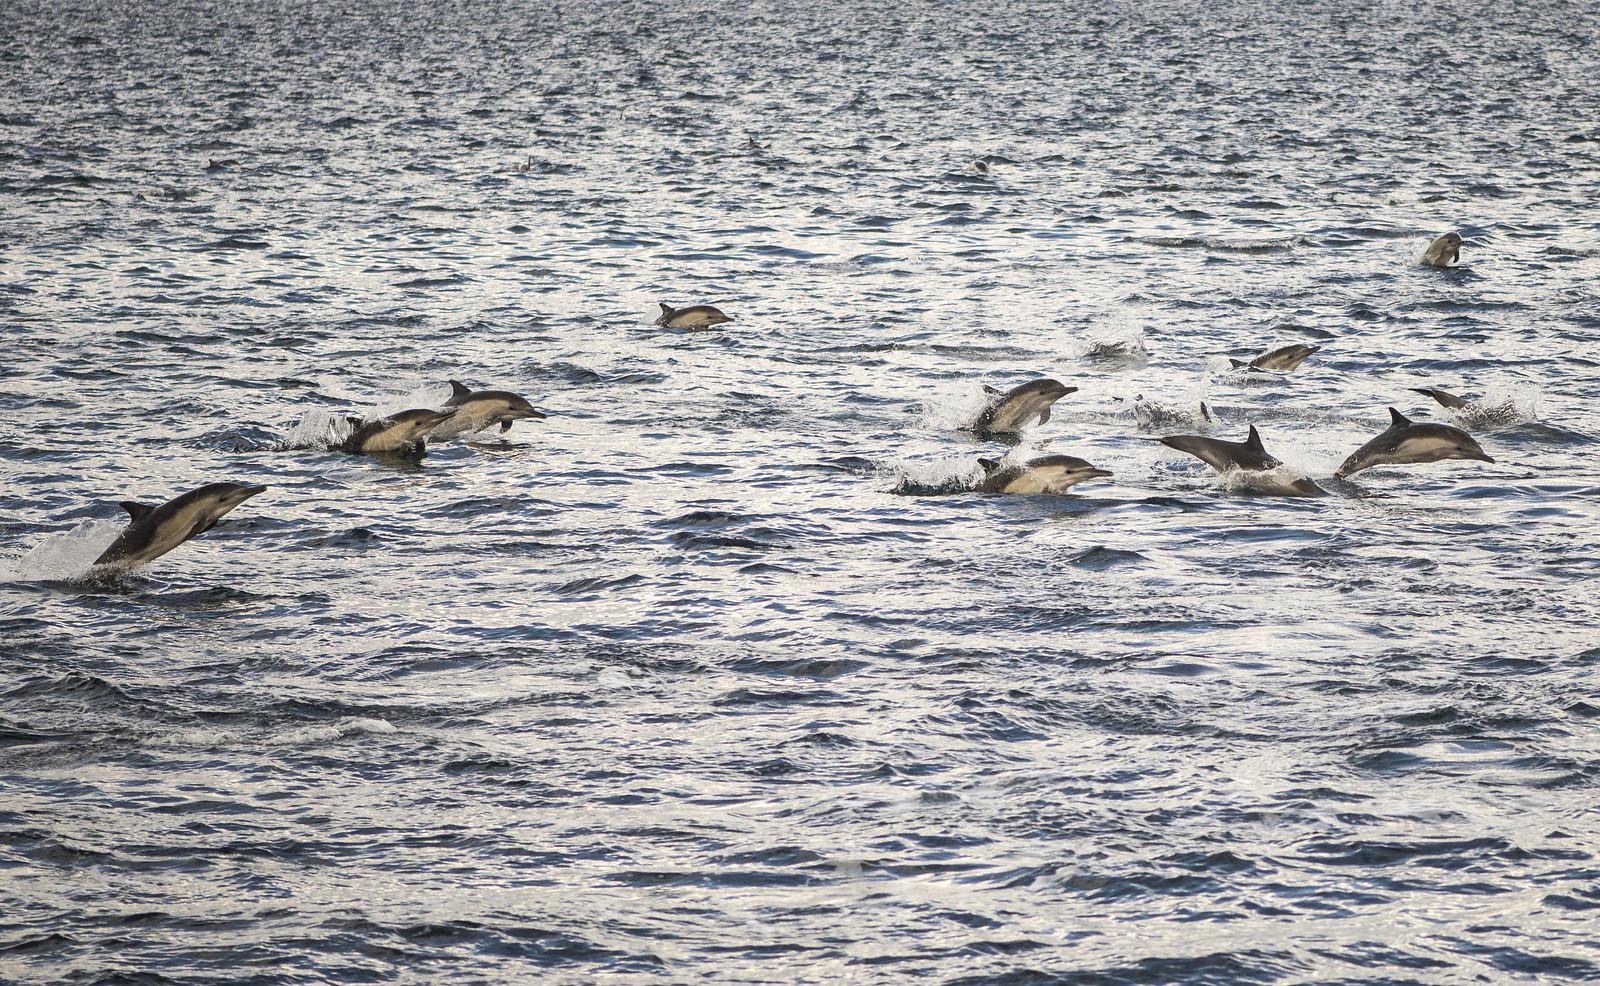 Common Dolphins - Santa Cruz Return